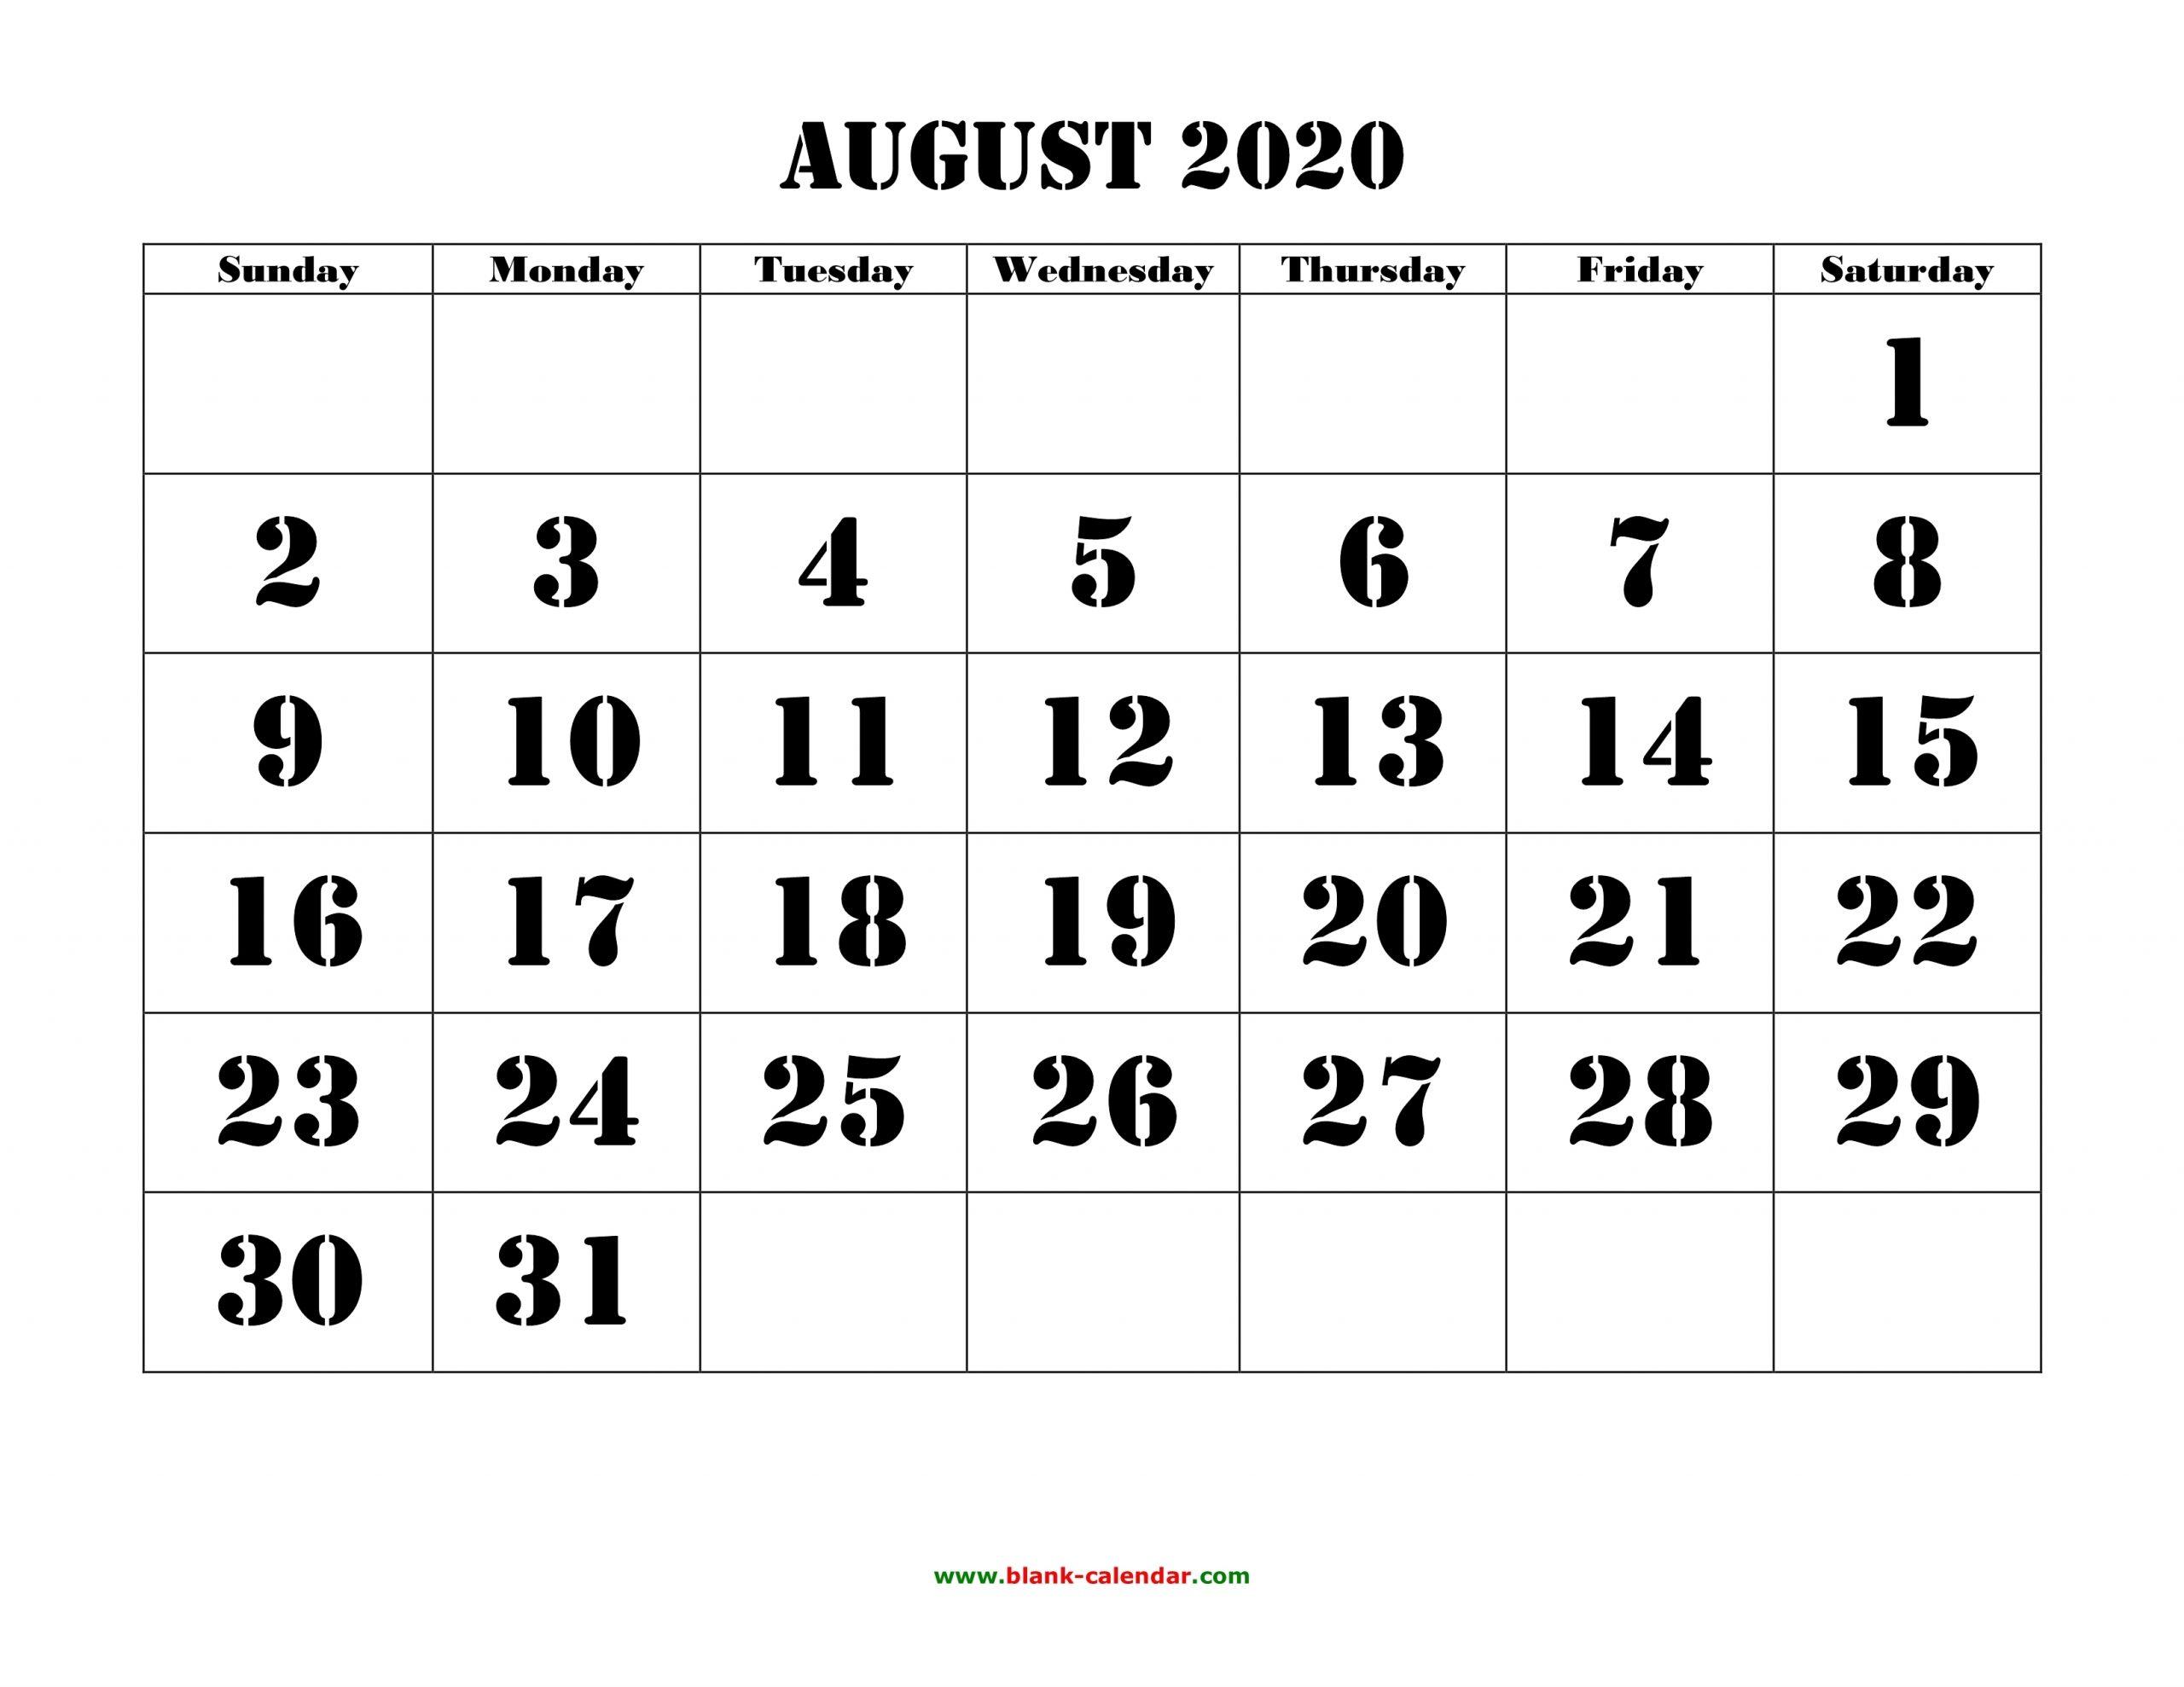 Free Download Printable August 2020 Calendar, Large Font with Printable Fill In 2020 Calendar Large Print